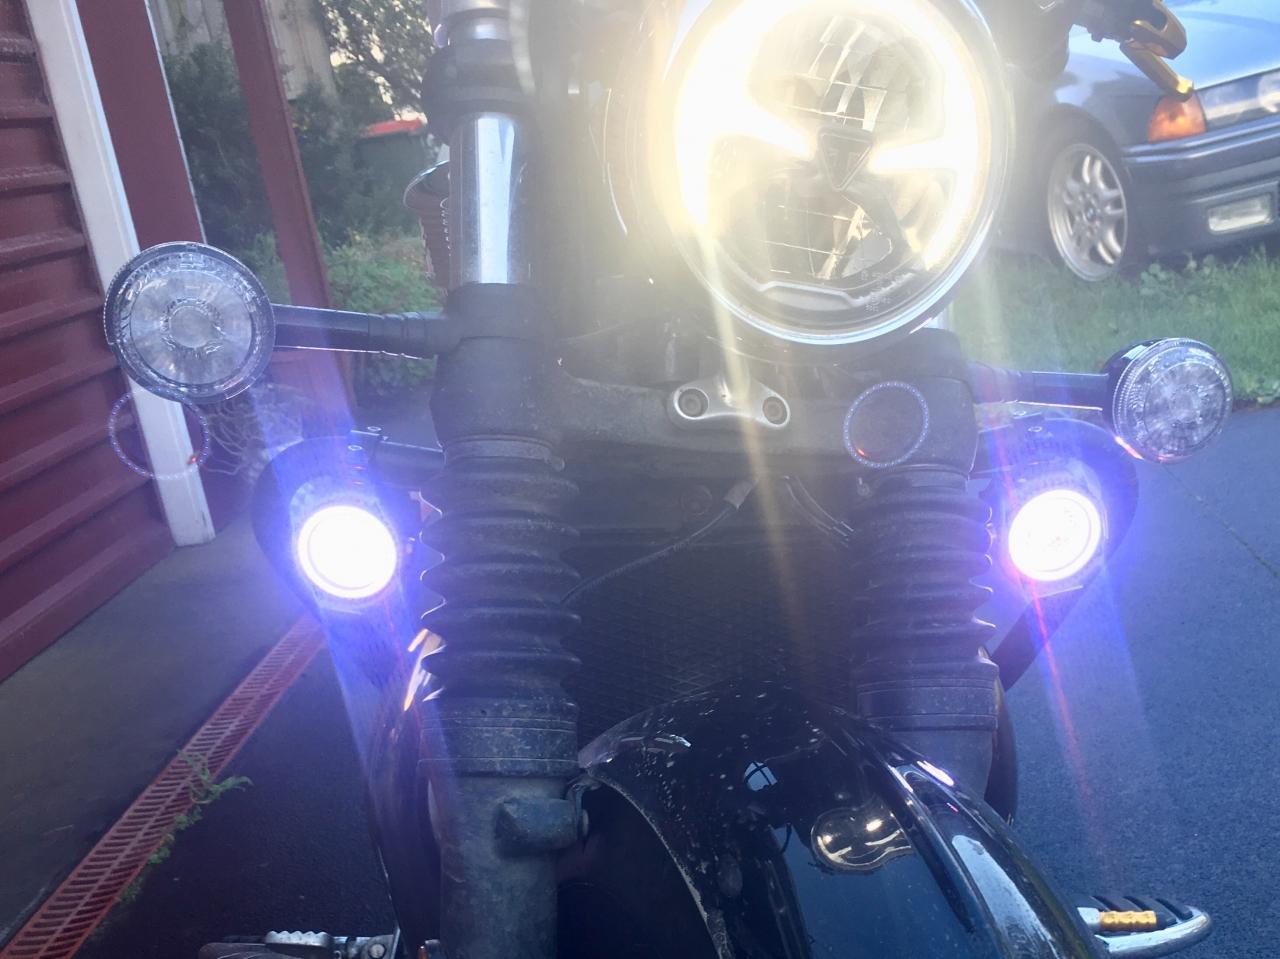 LED ride lights reposition